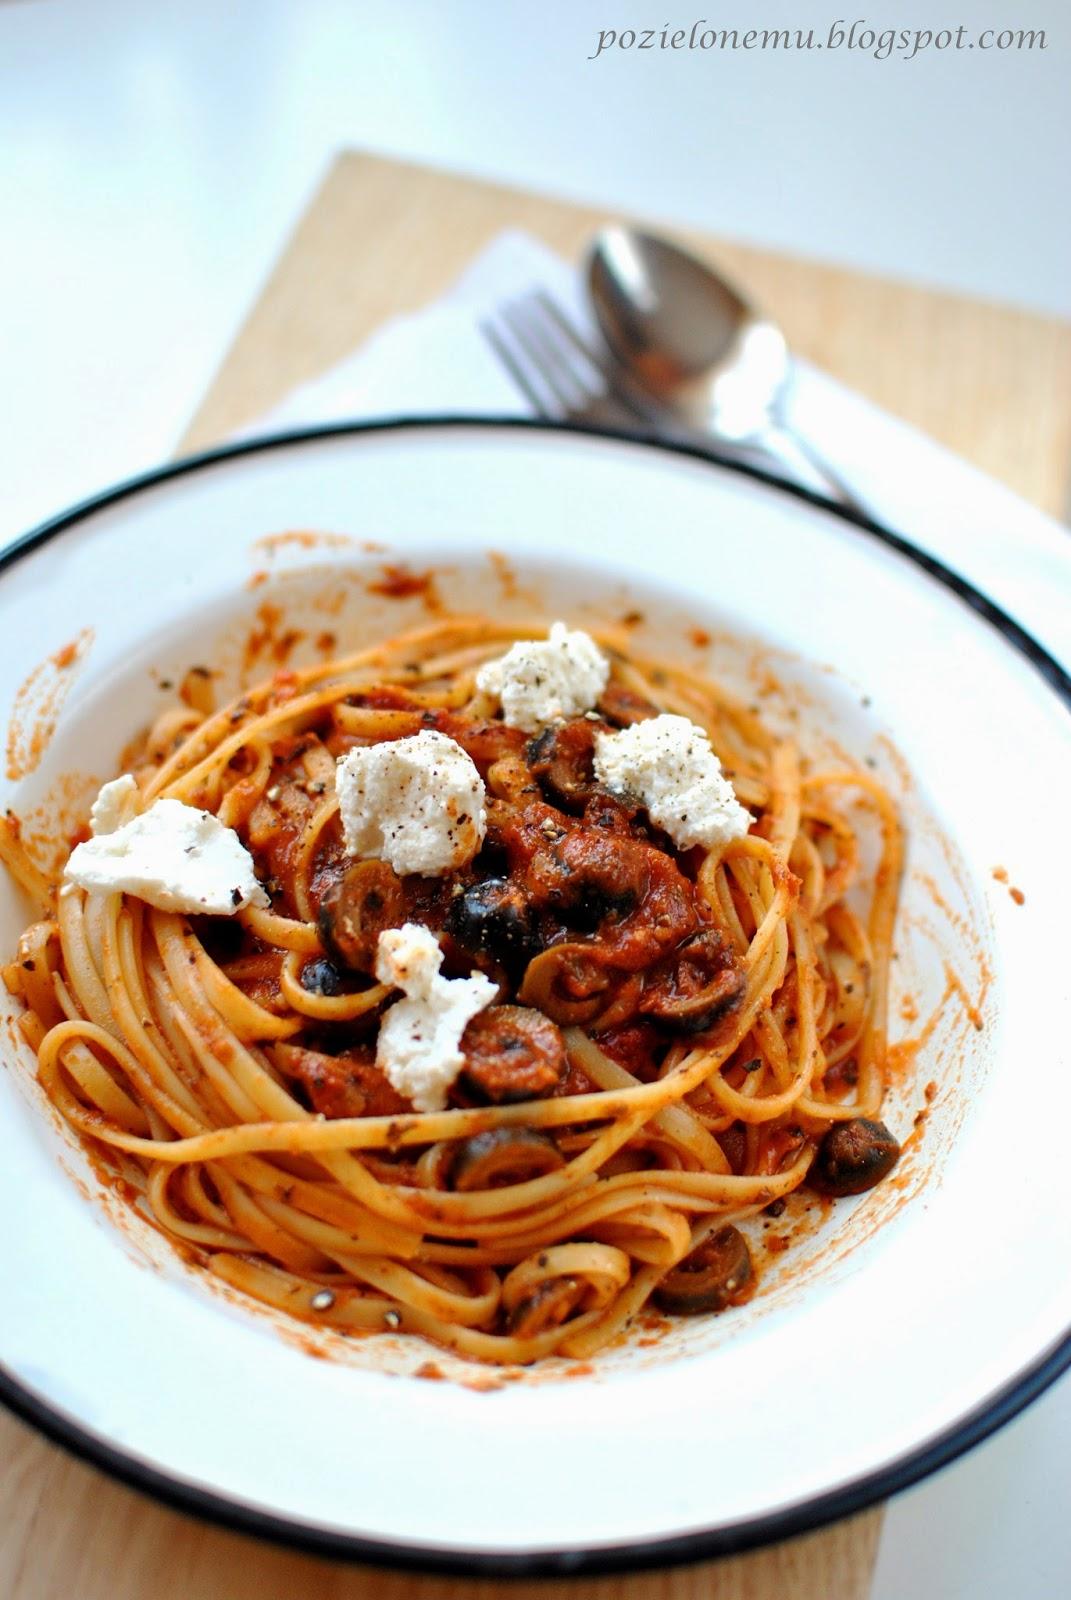 spaghetti w pomidorach